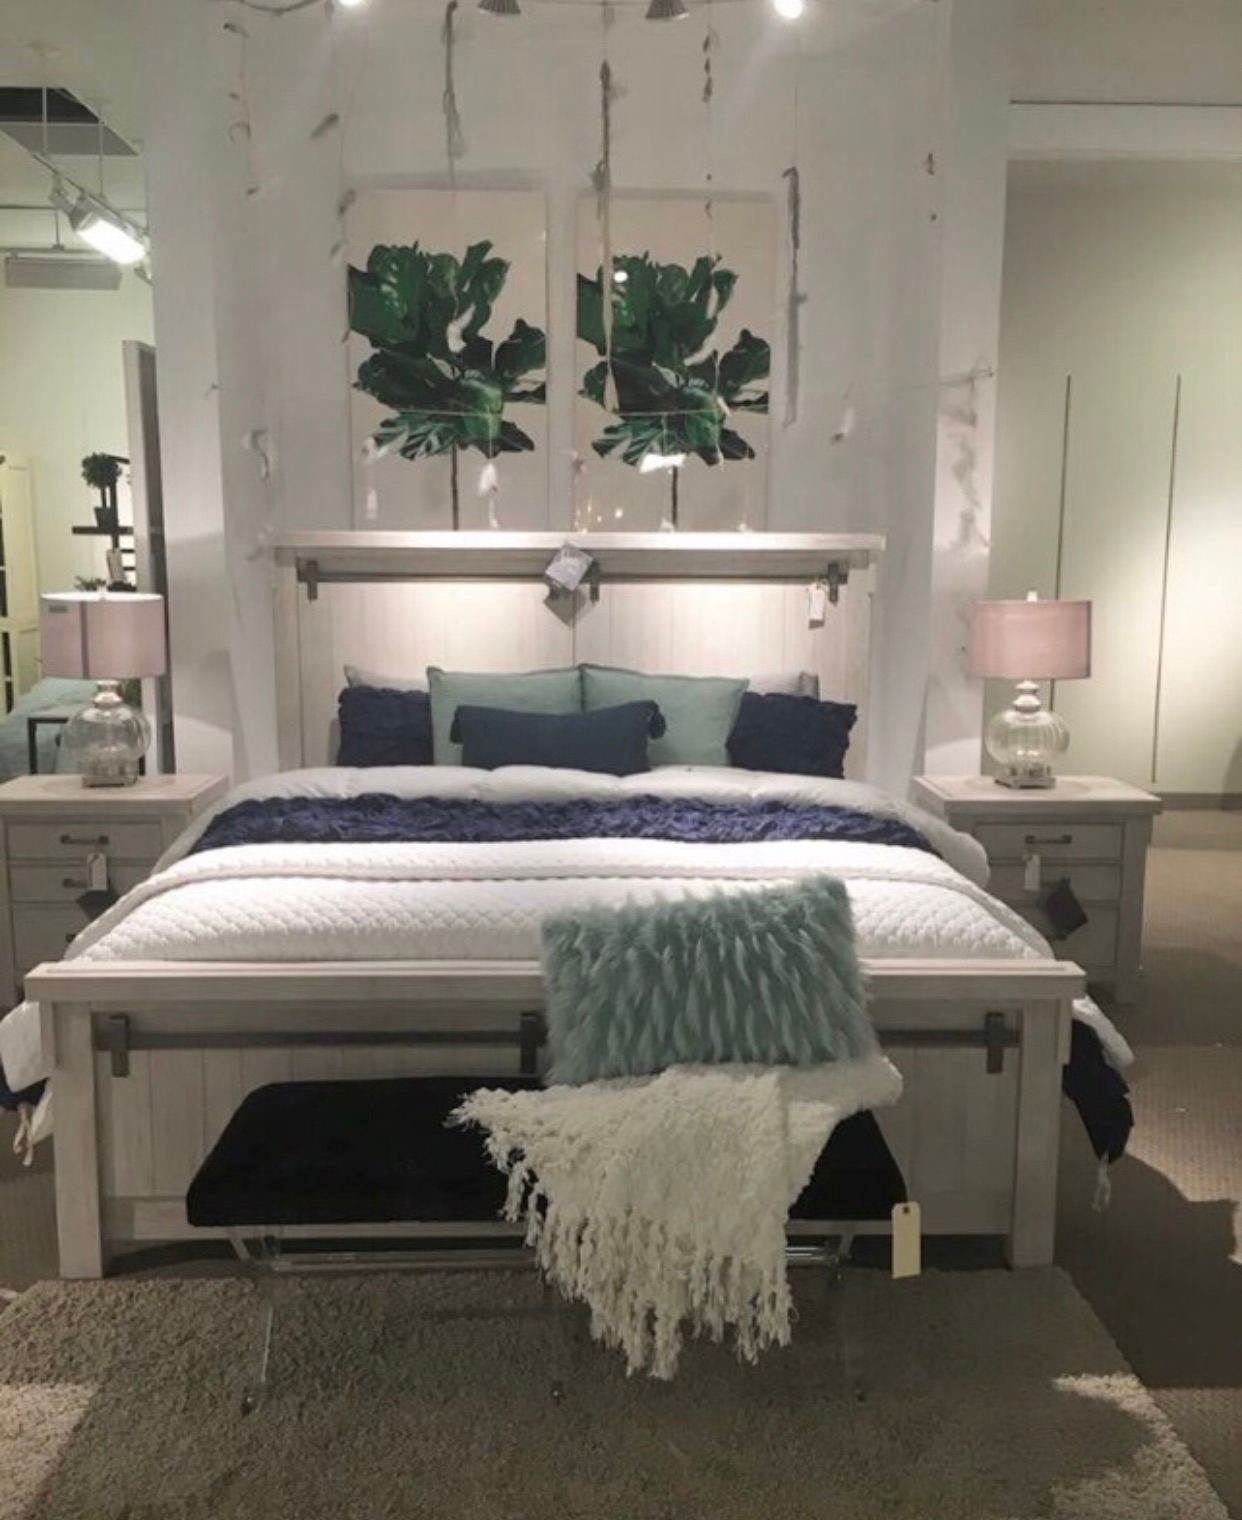 Brashland Complete Bed in 2019 Modern bedroom, Trendy